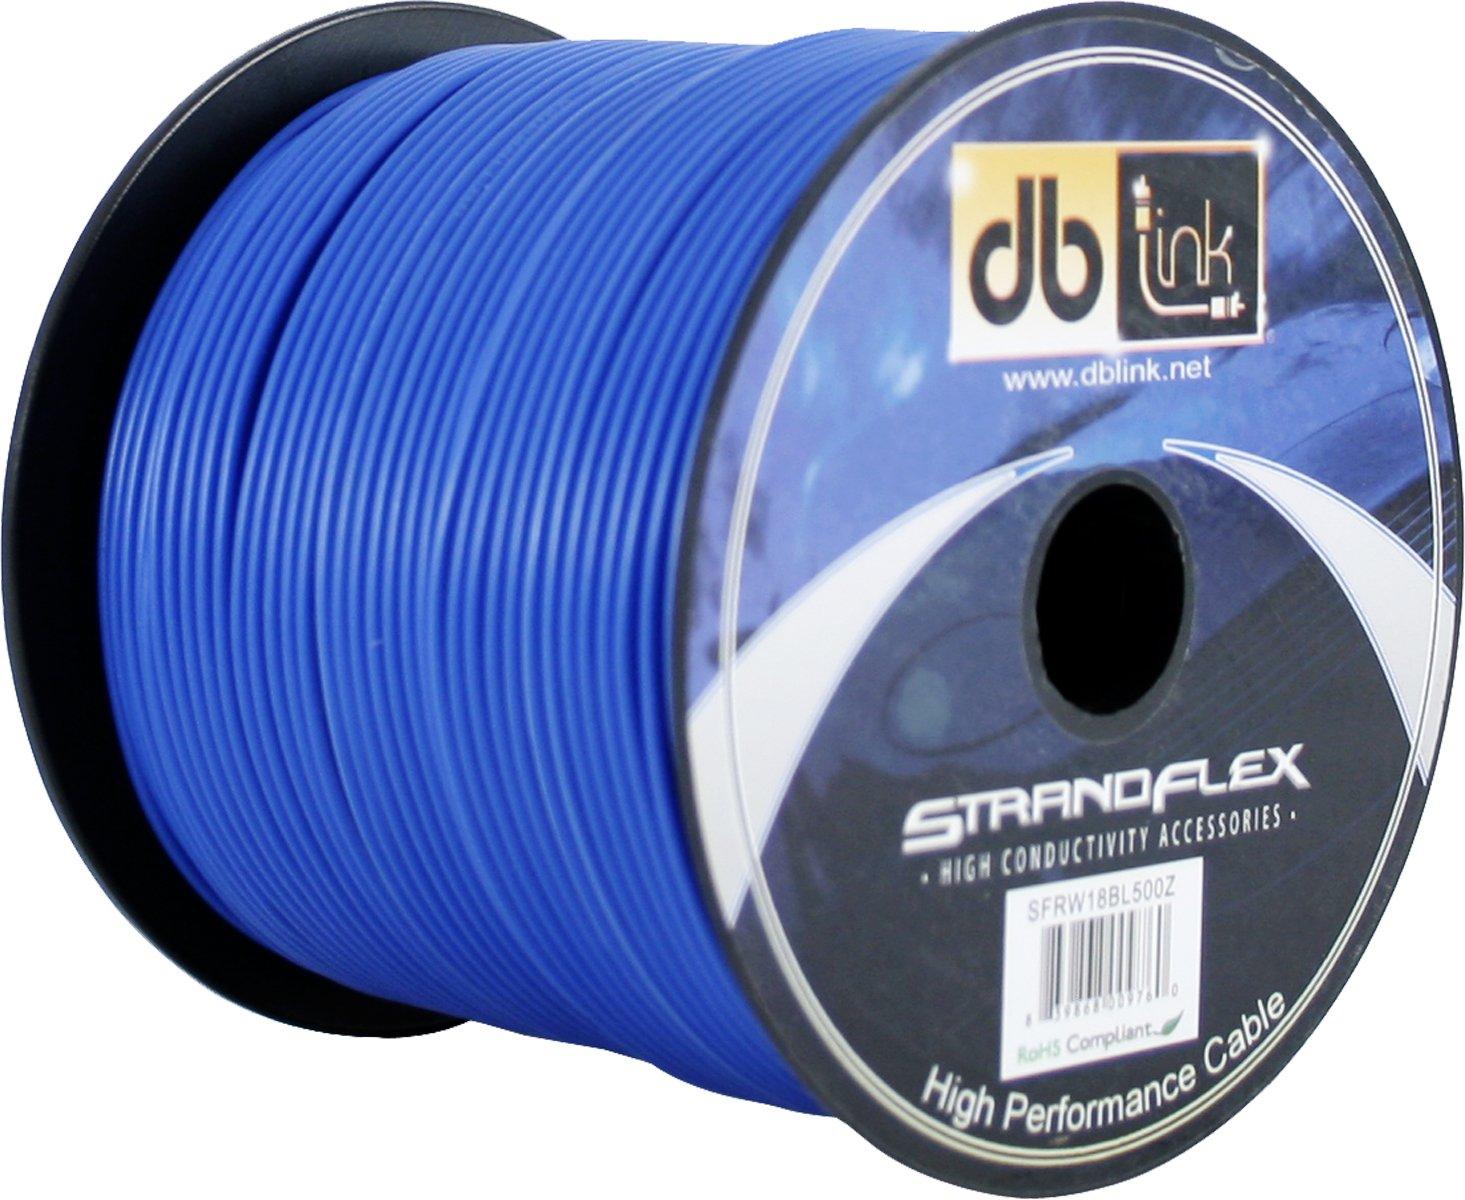 Blue DB Research L.L.P. db Link SFRW18BL500Z StrandFlex Power Wire Spools Round Jacket